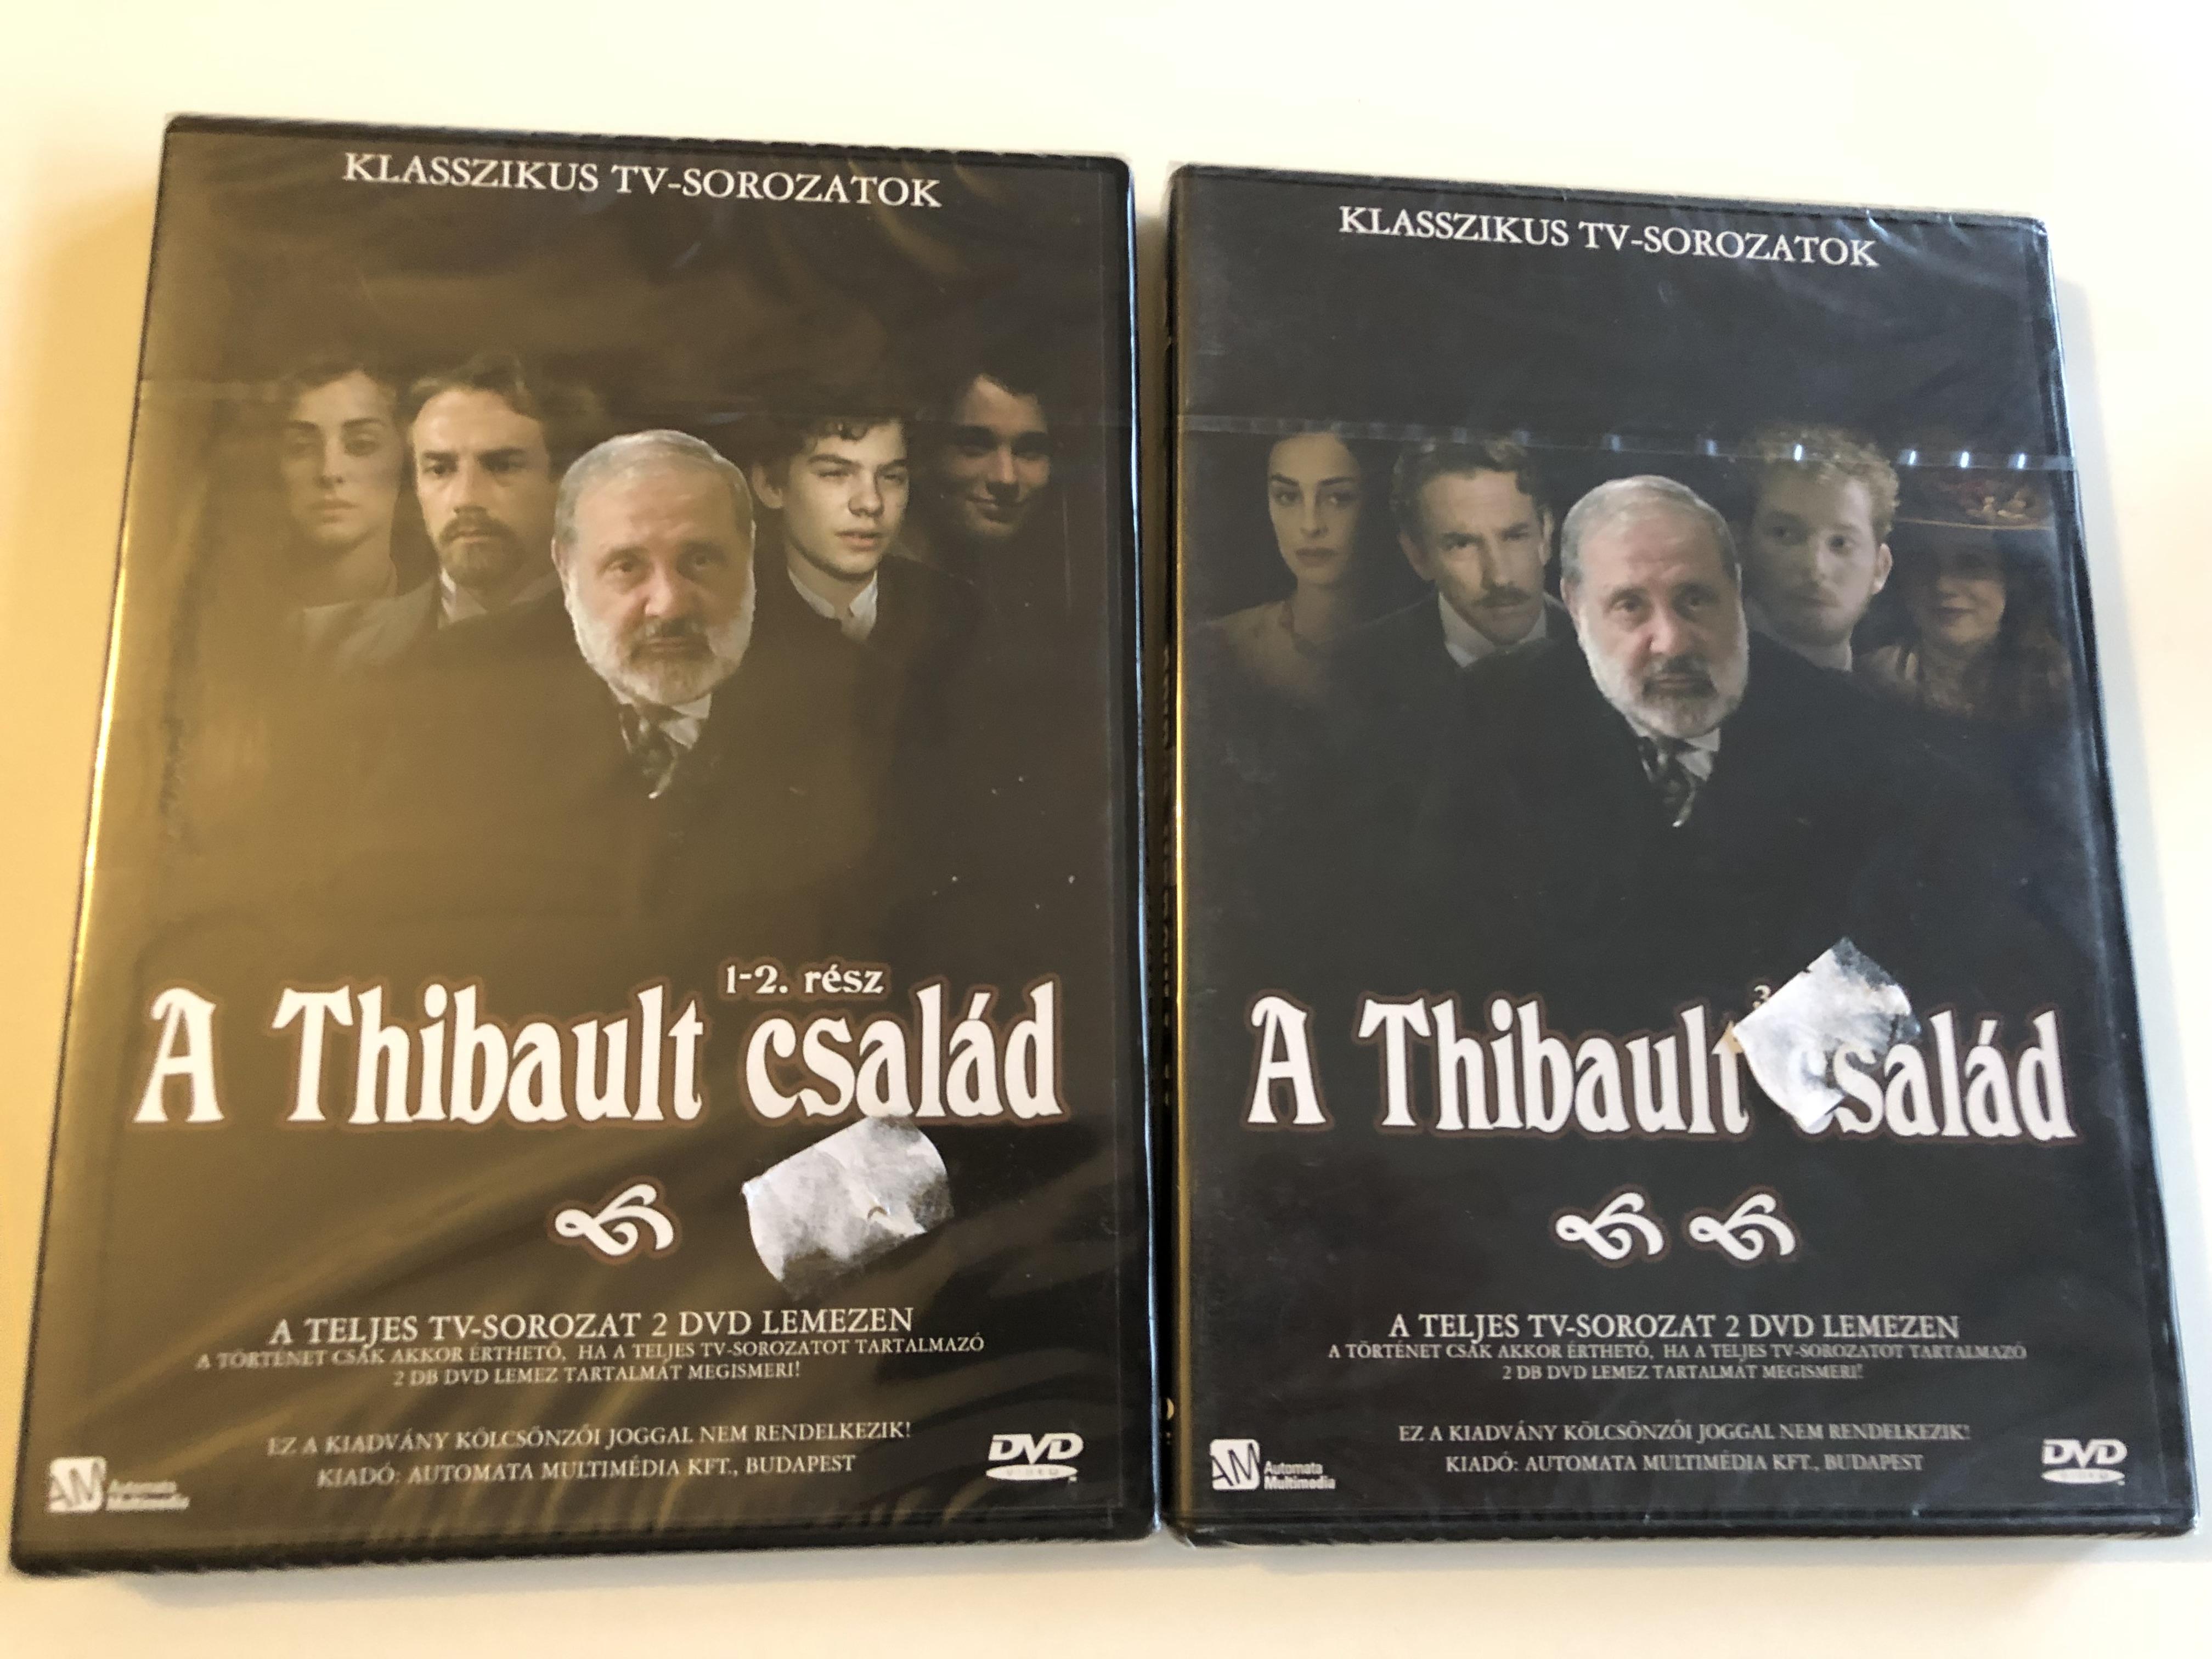 -les-thibault-dvd-2003-a-thibault-csal-d-directed-by-jean-daniel-verhaeghe-starring-jean-yanne-jean-pierre-lorit-geordy-monfil-didier-bezace-french-tv-miniseries-5999552560504-.jpg